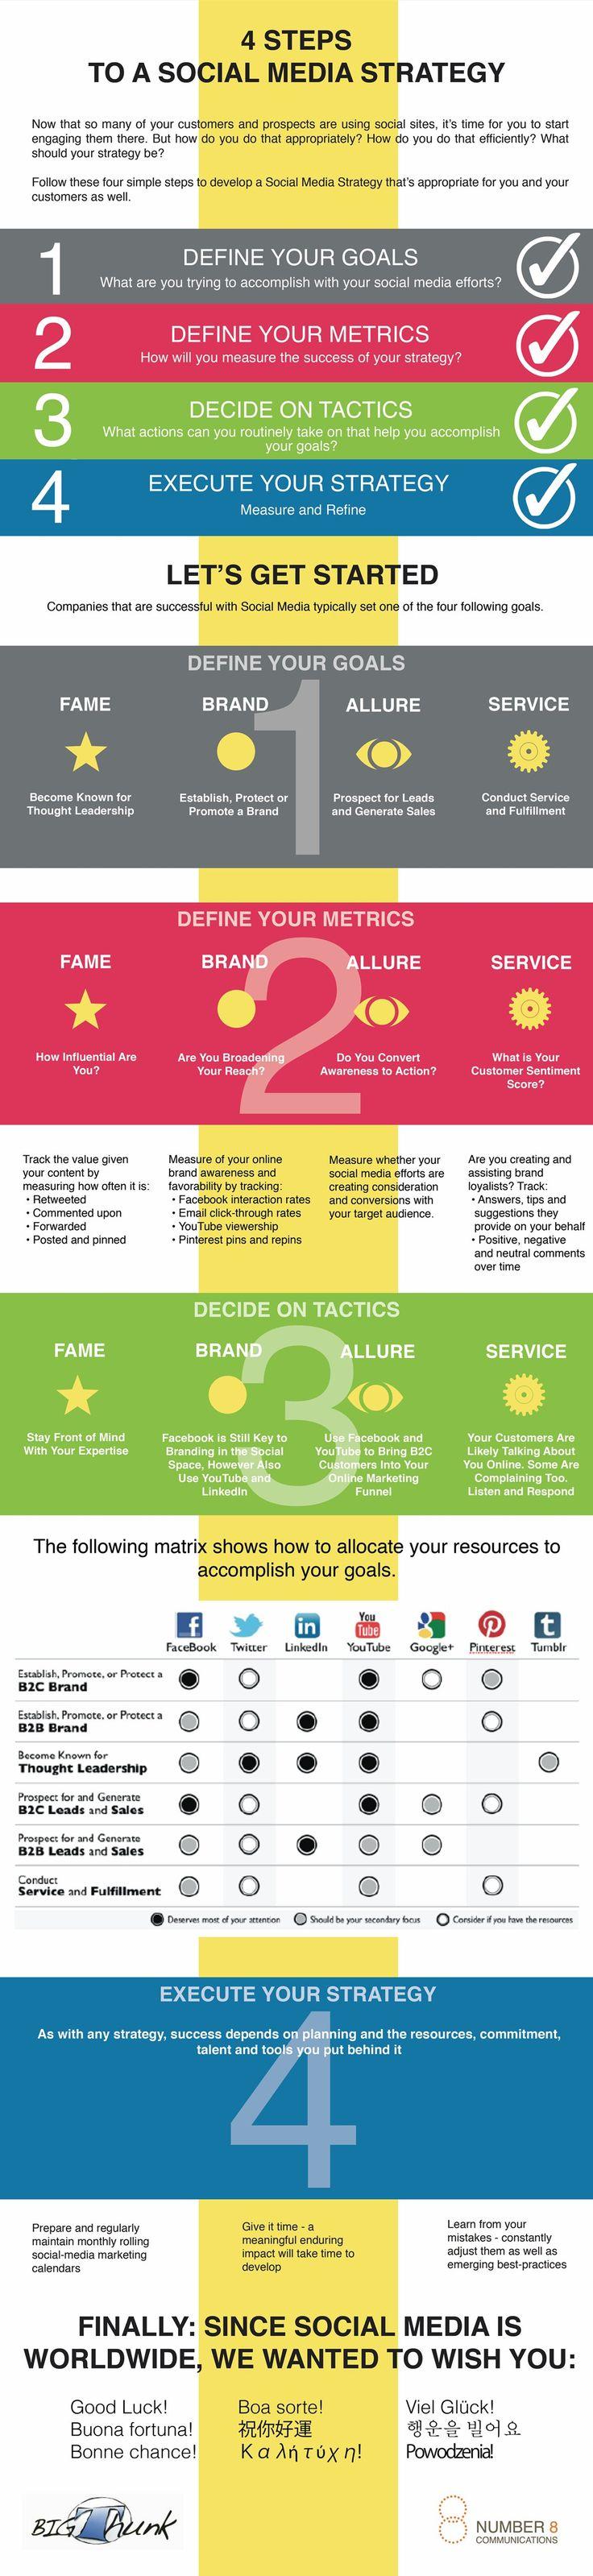 Best Social Media Images On Pinterest - Social media marketing business plan template